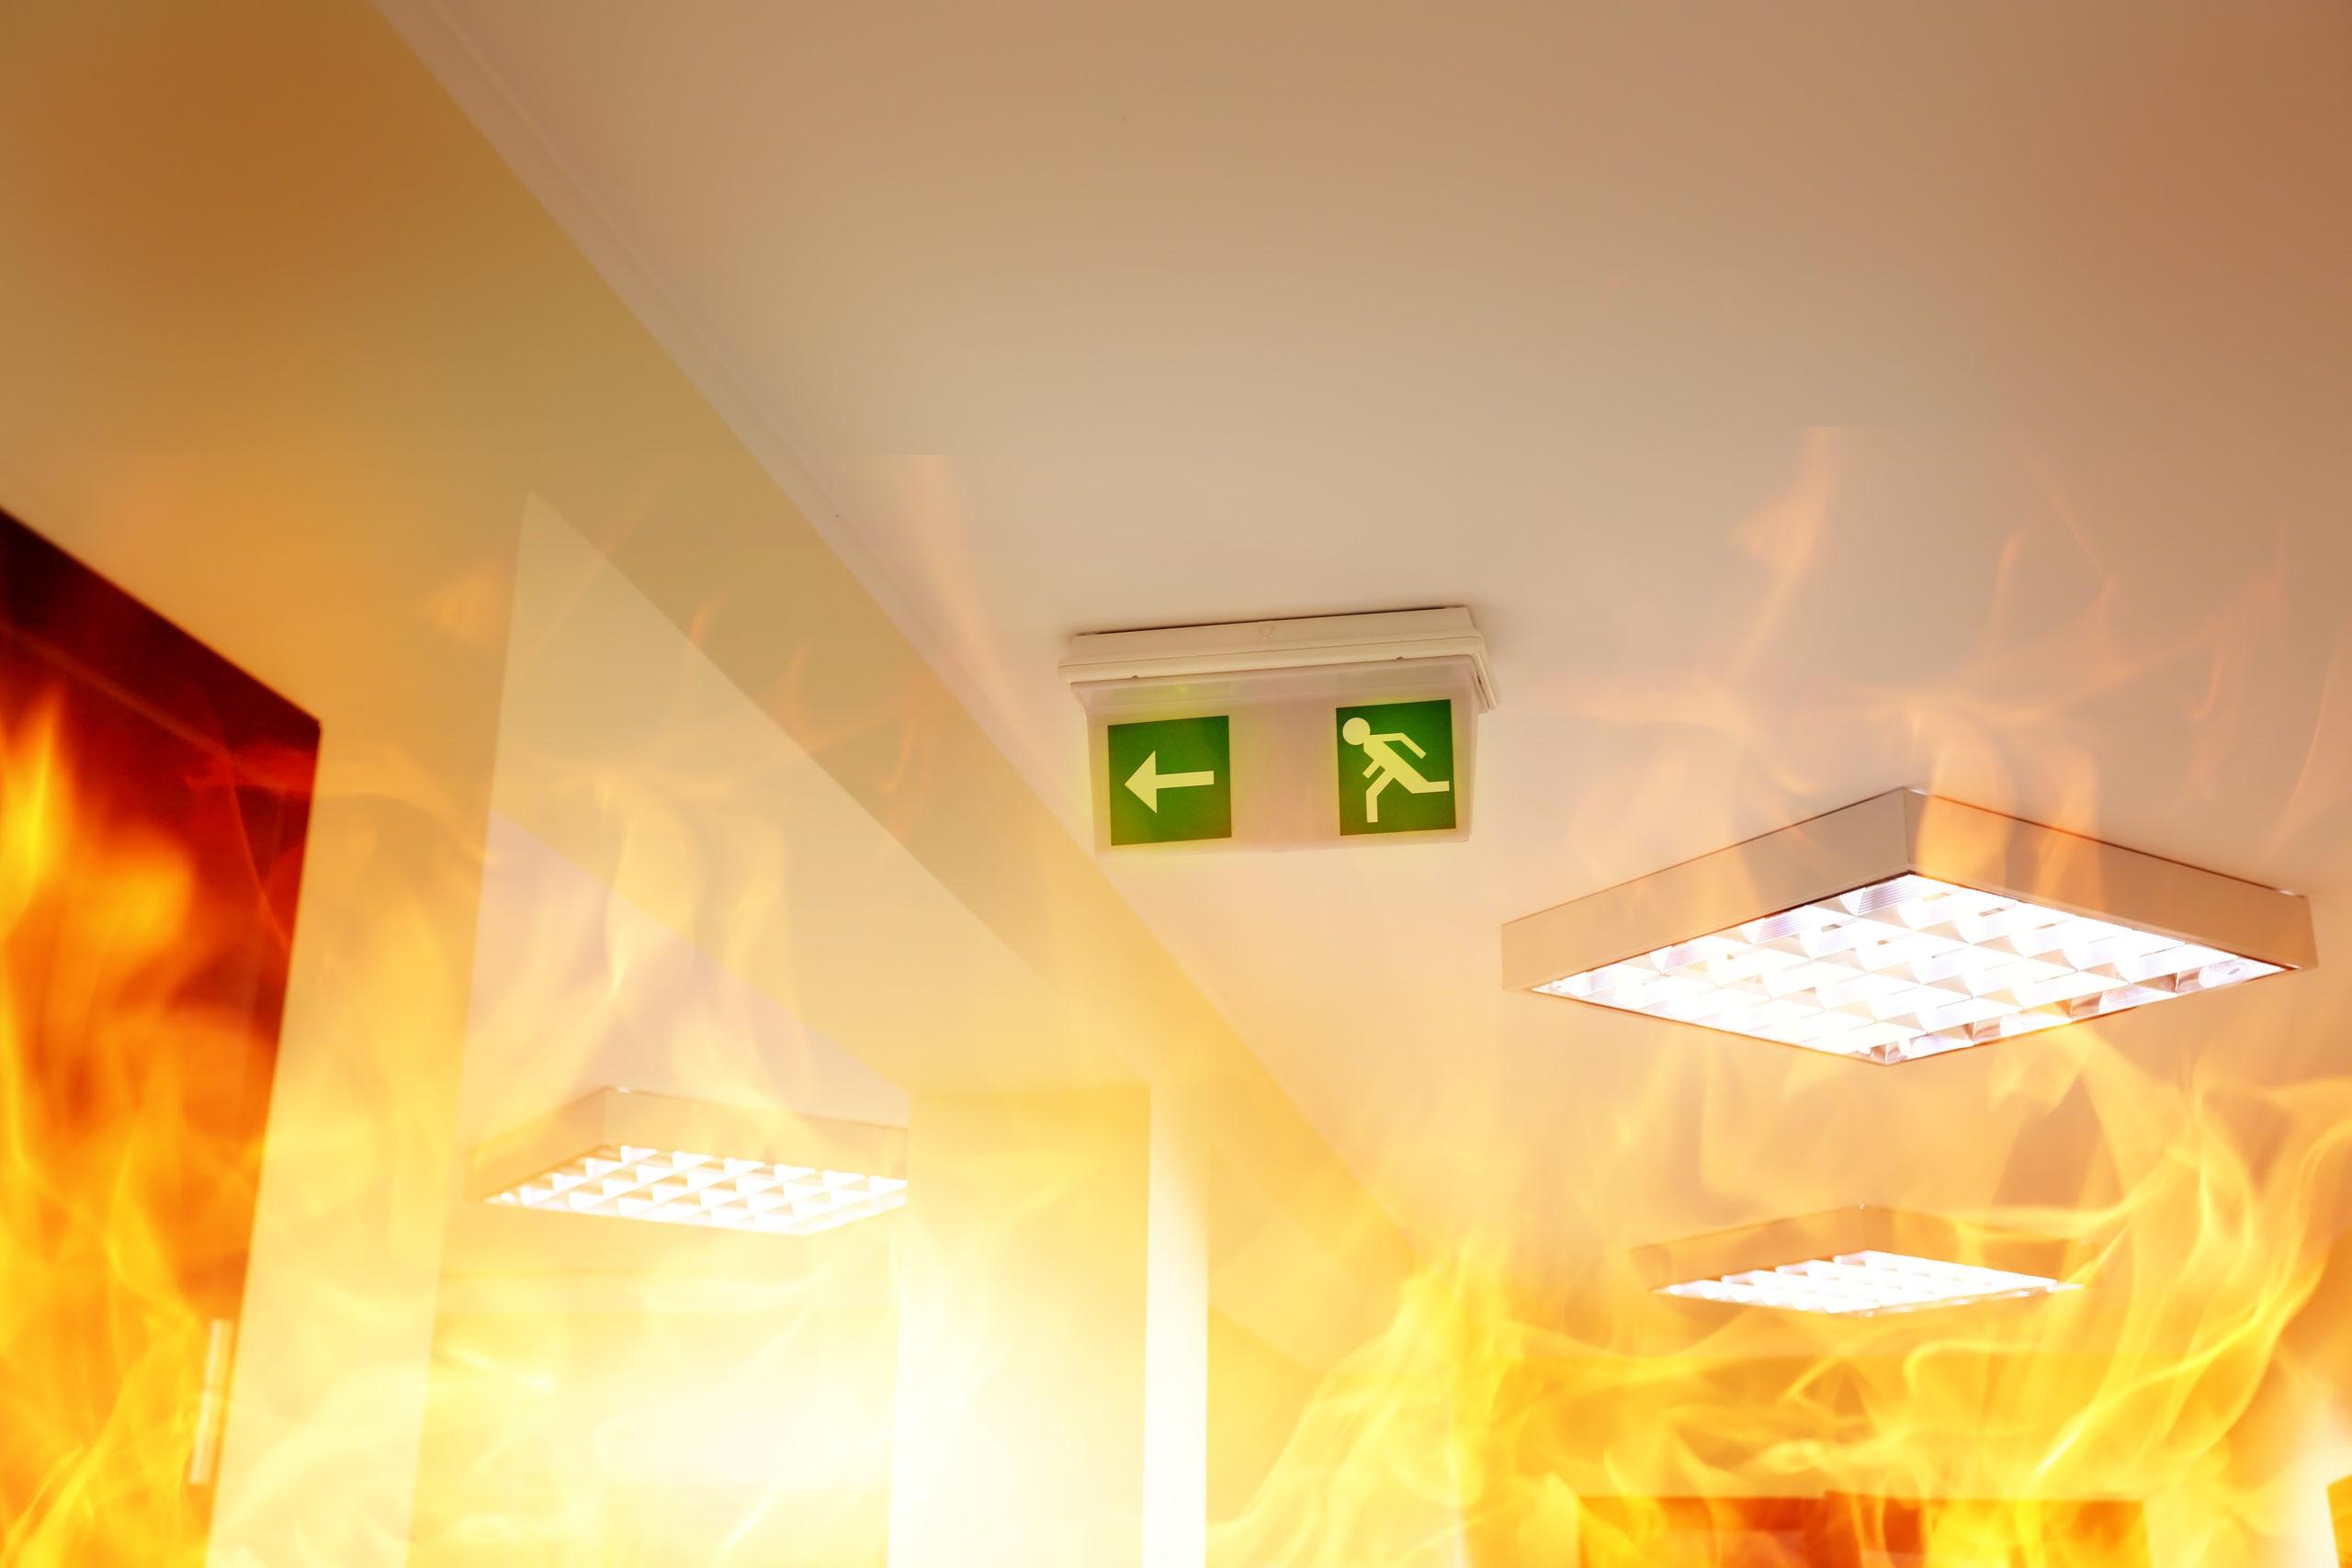 Incendie / Evacuation